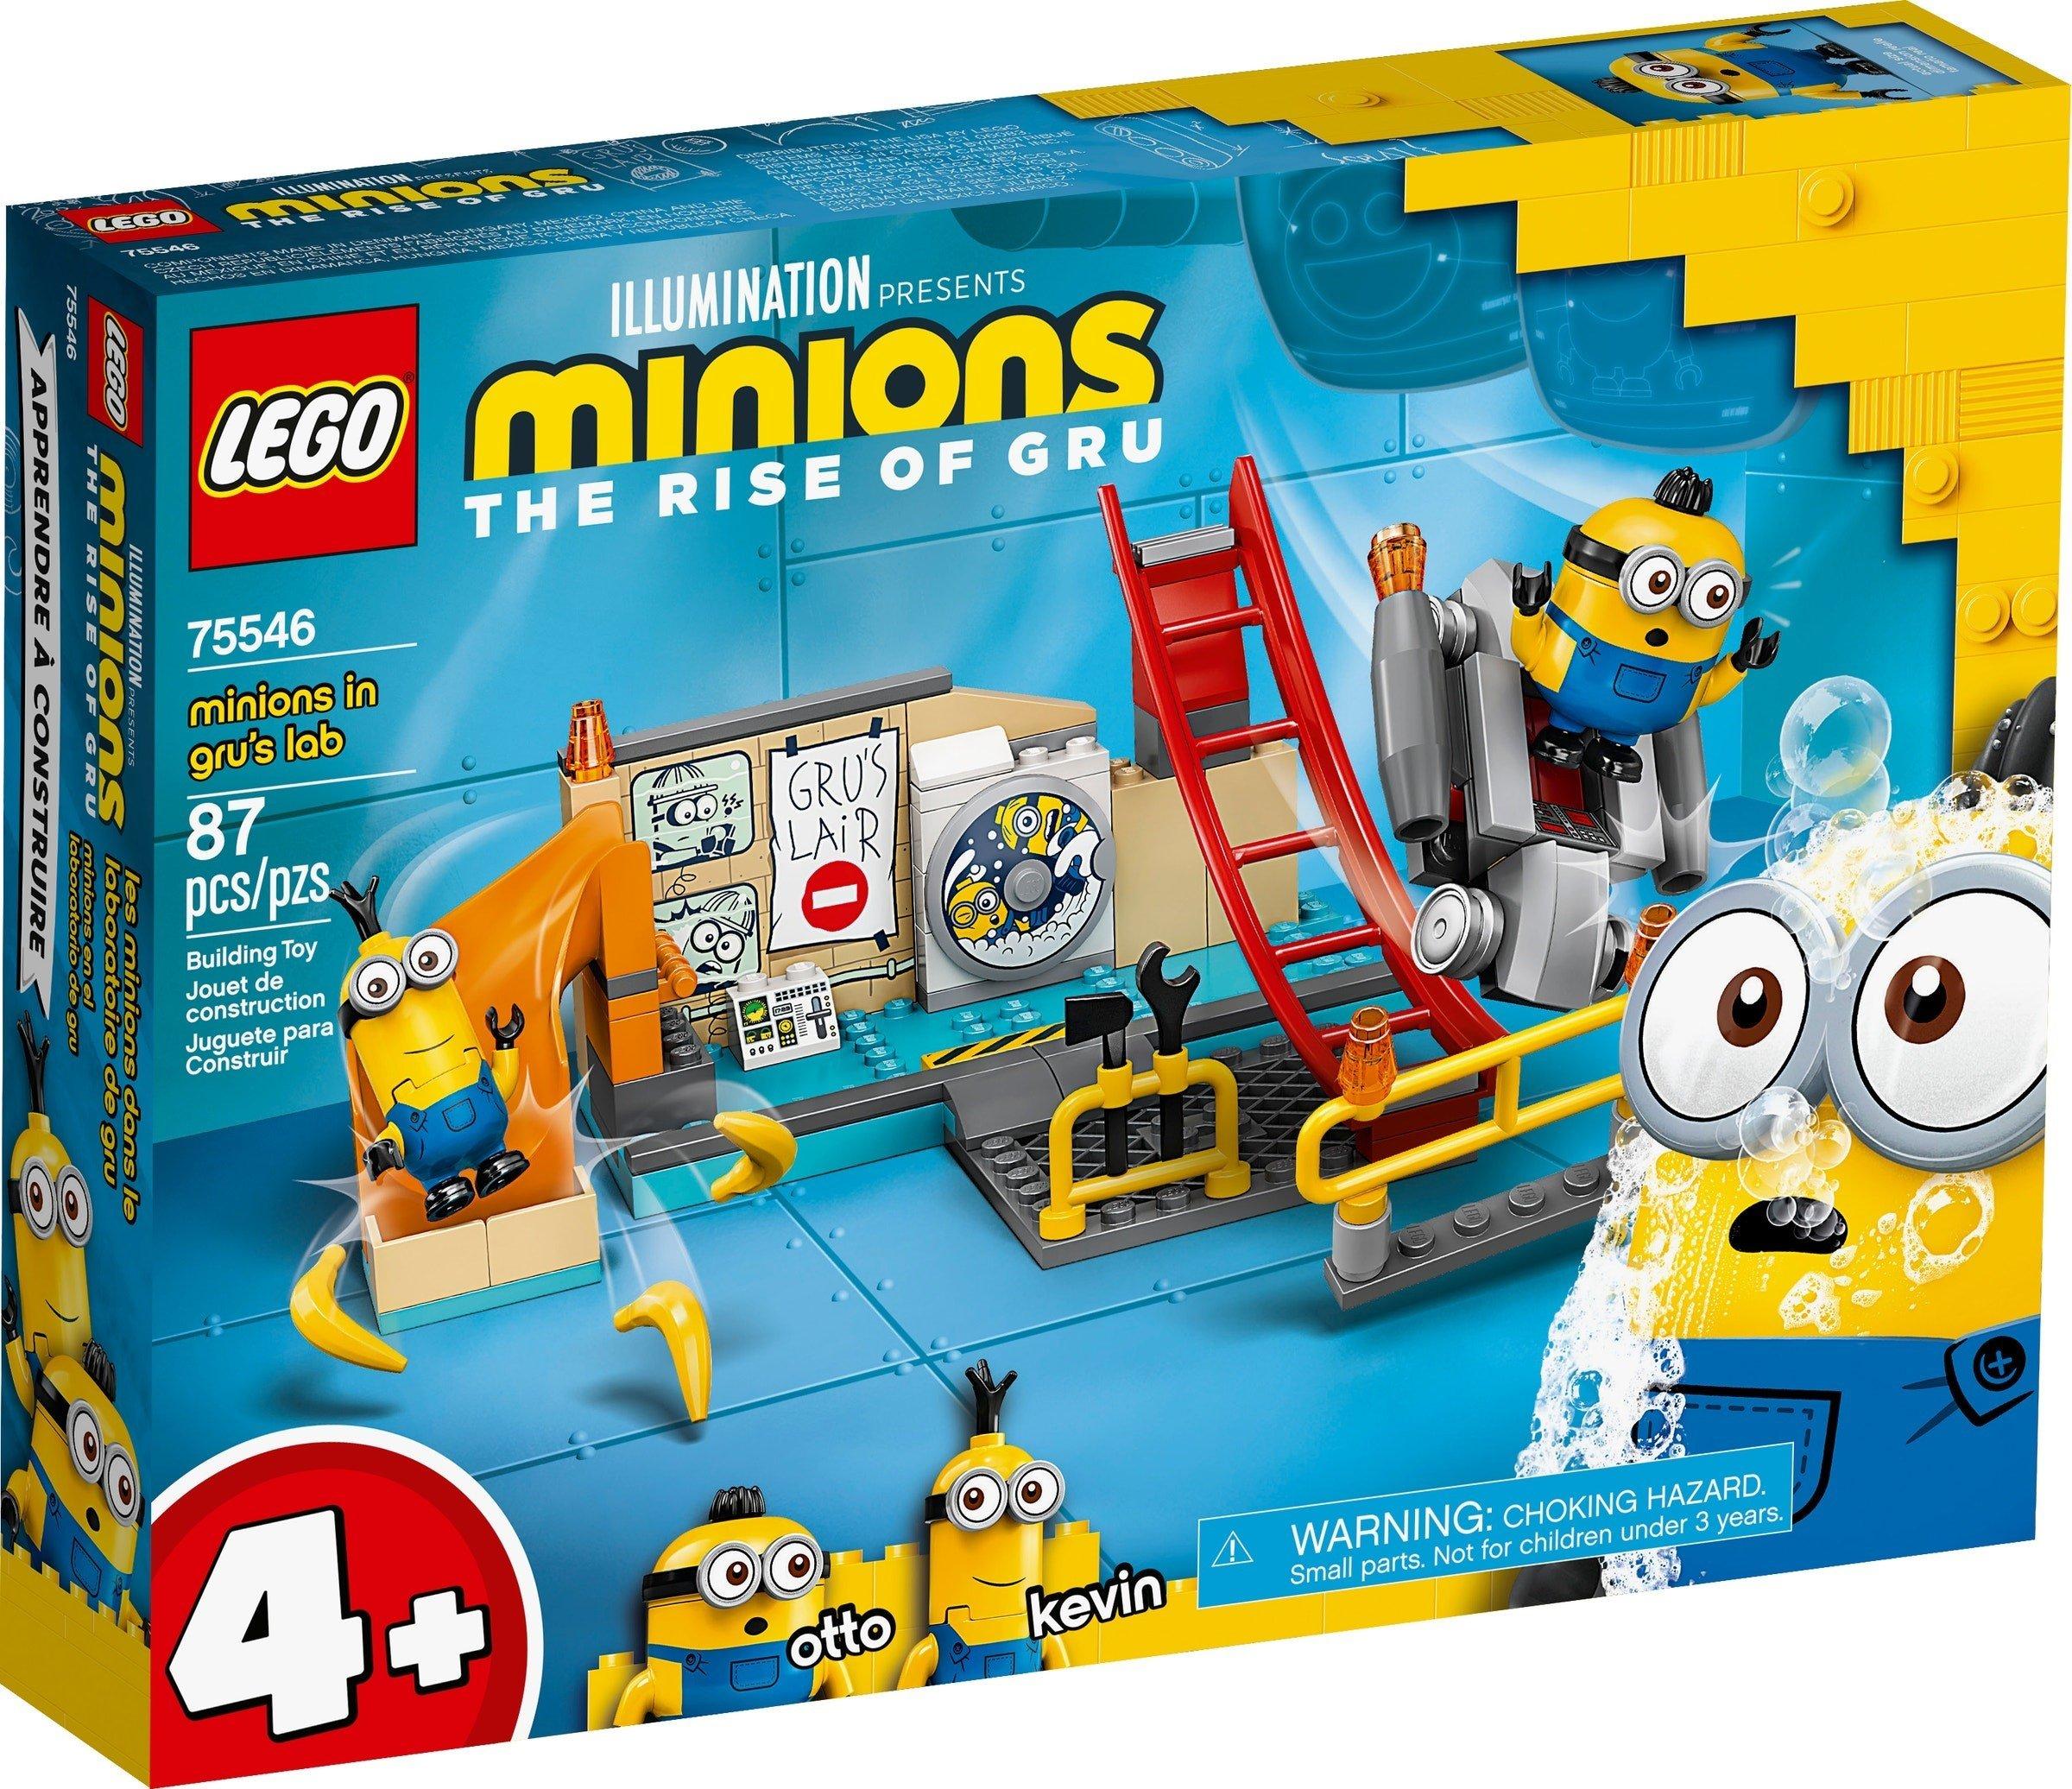 LEGO Minions - Minions in Gru's Lab (75546)